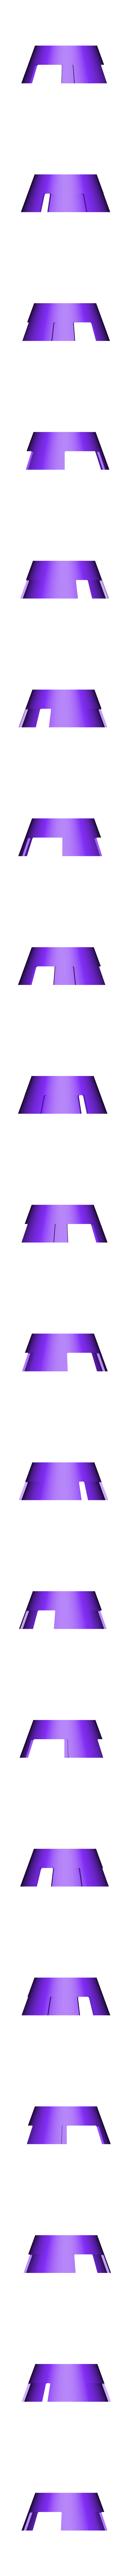 Pièce 1.STL Download STL file Translocator Sombra • 3D print model, Midnight_05